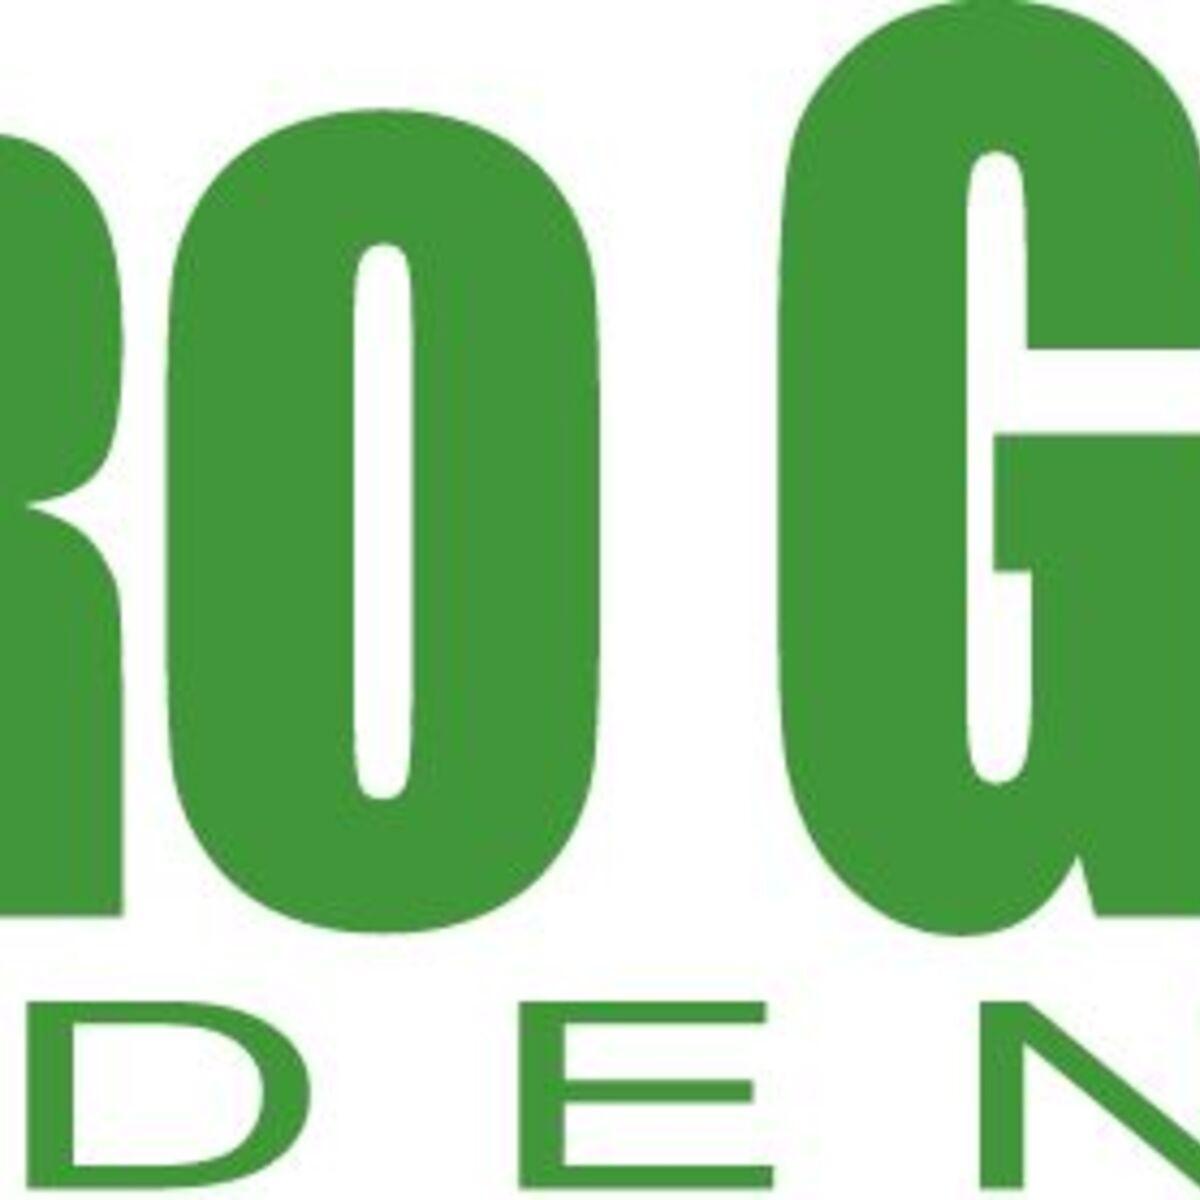 Craigslist Nh Apartments: Contact Us Metro Green Apartments